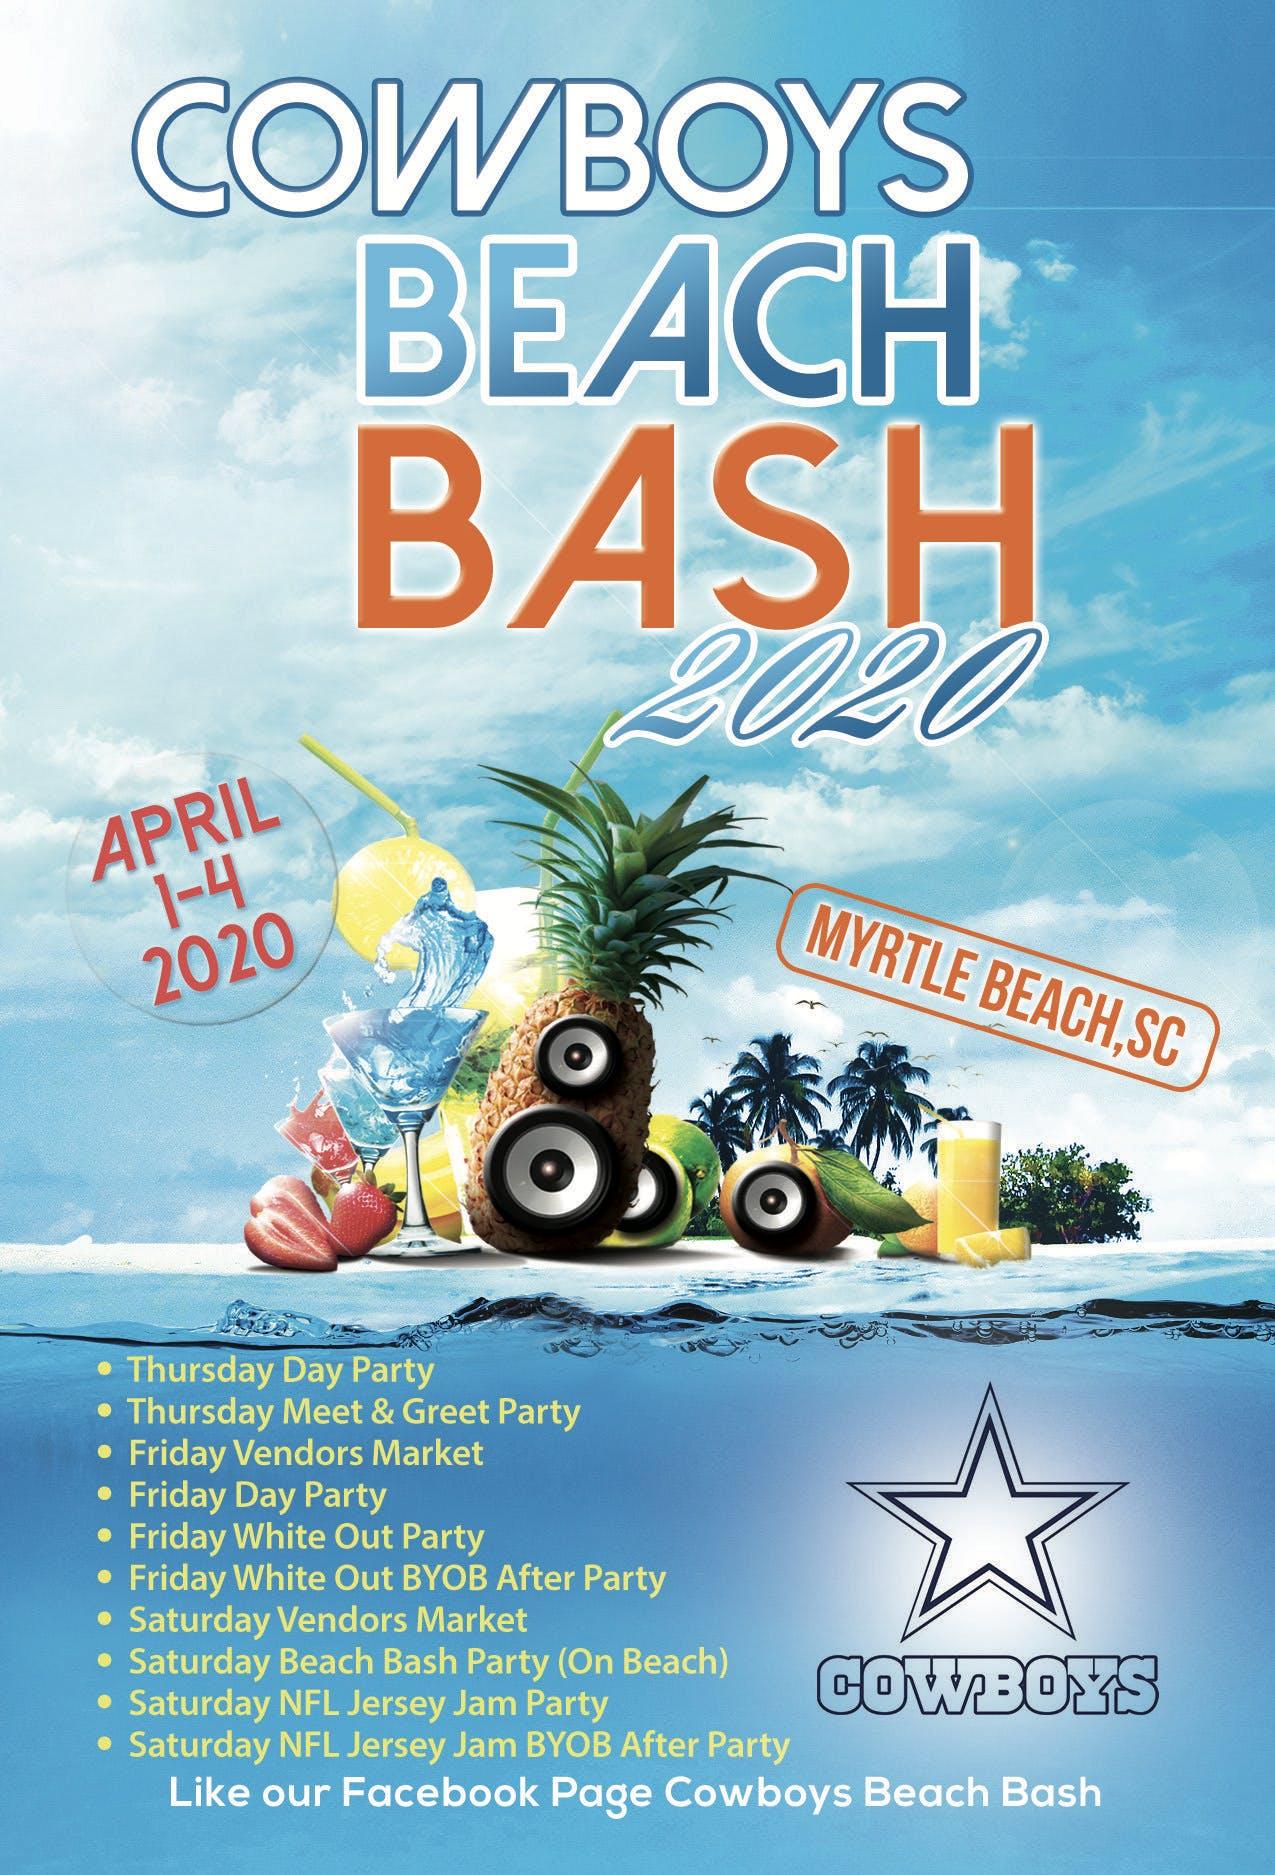 Myrtle Beach Events April 2020.Cowboys Beach Bash At Sands Ocean Club Resort Myrtle Beach